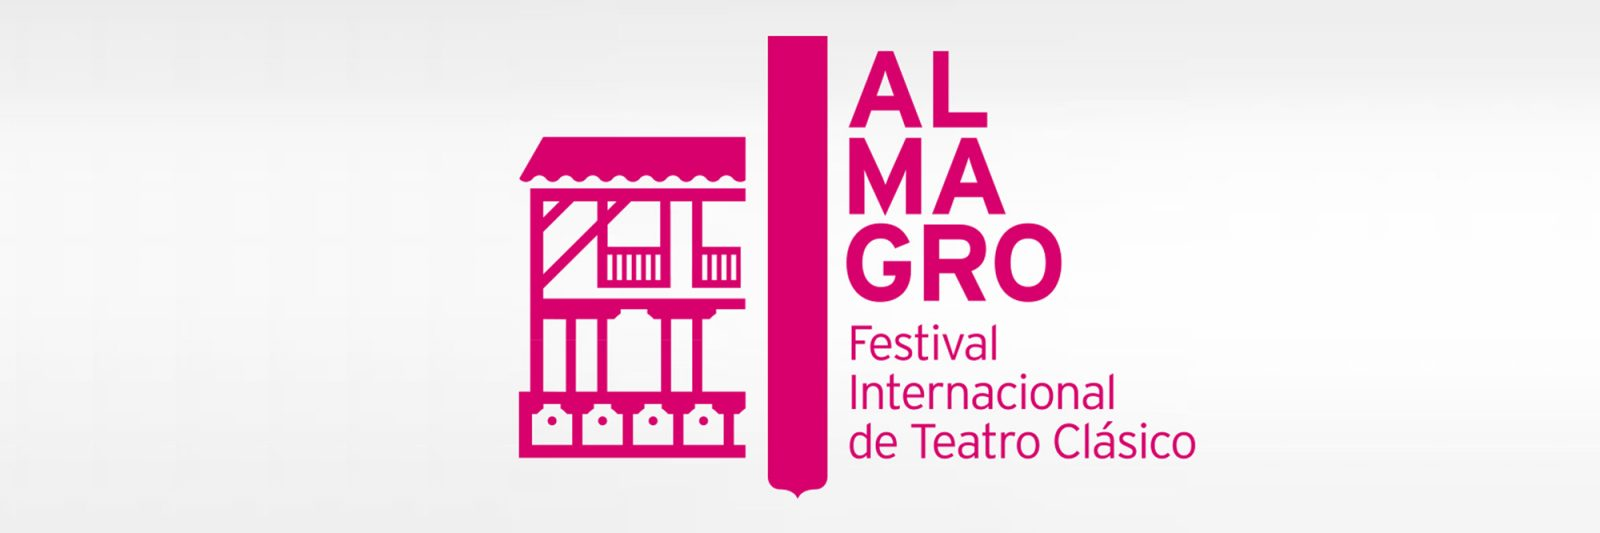 logotipo Festival Almagro